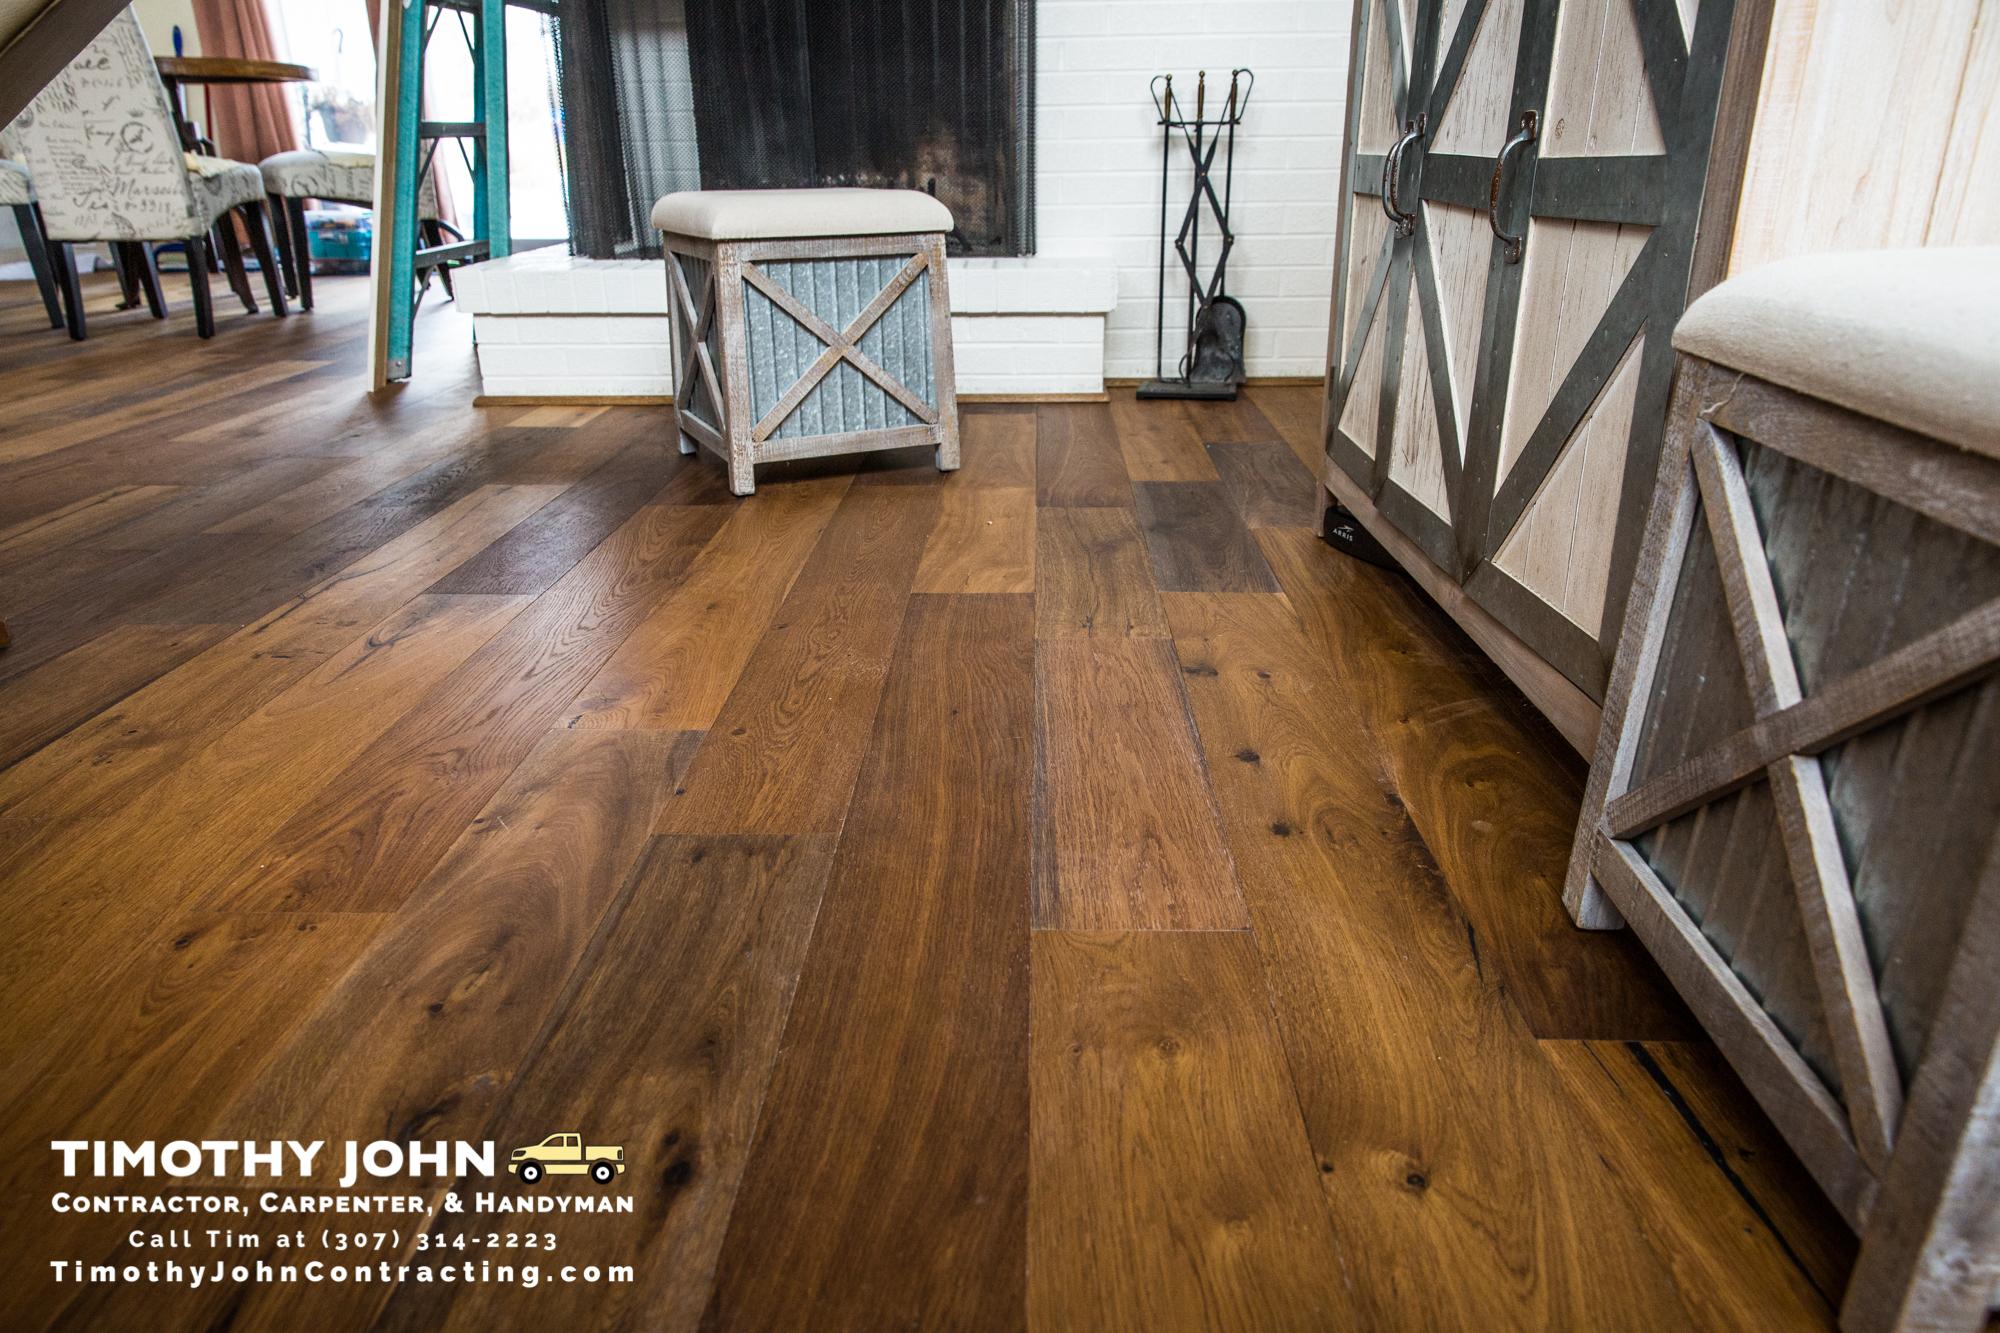 Timothy-John-Contractor-Flooring-Tile-Laramie-Wyoming-13.jpg